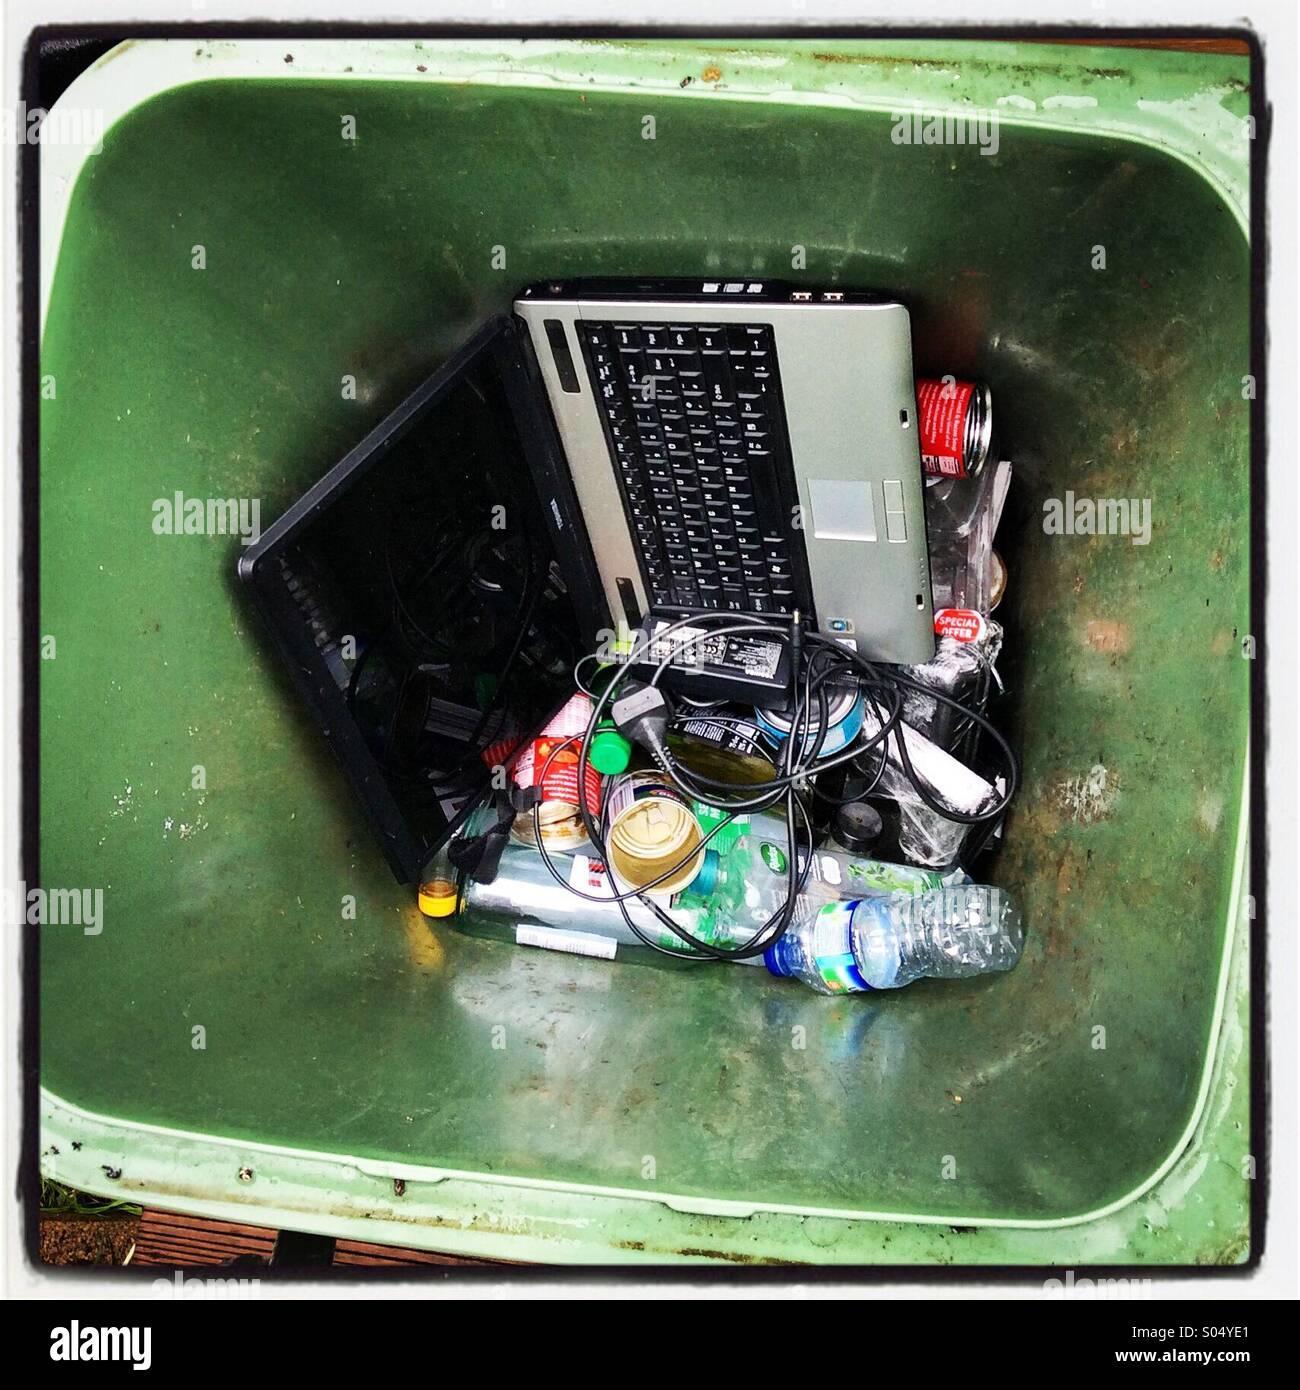 Obsolete laptop in the rubbish bin - Stock Image